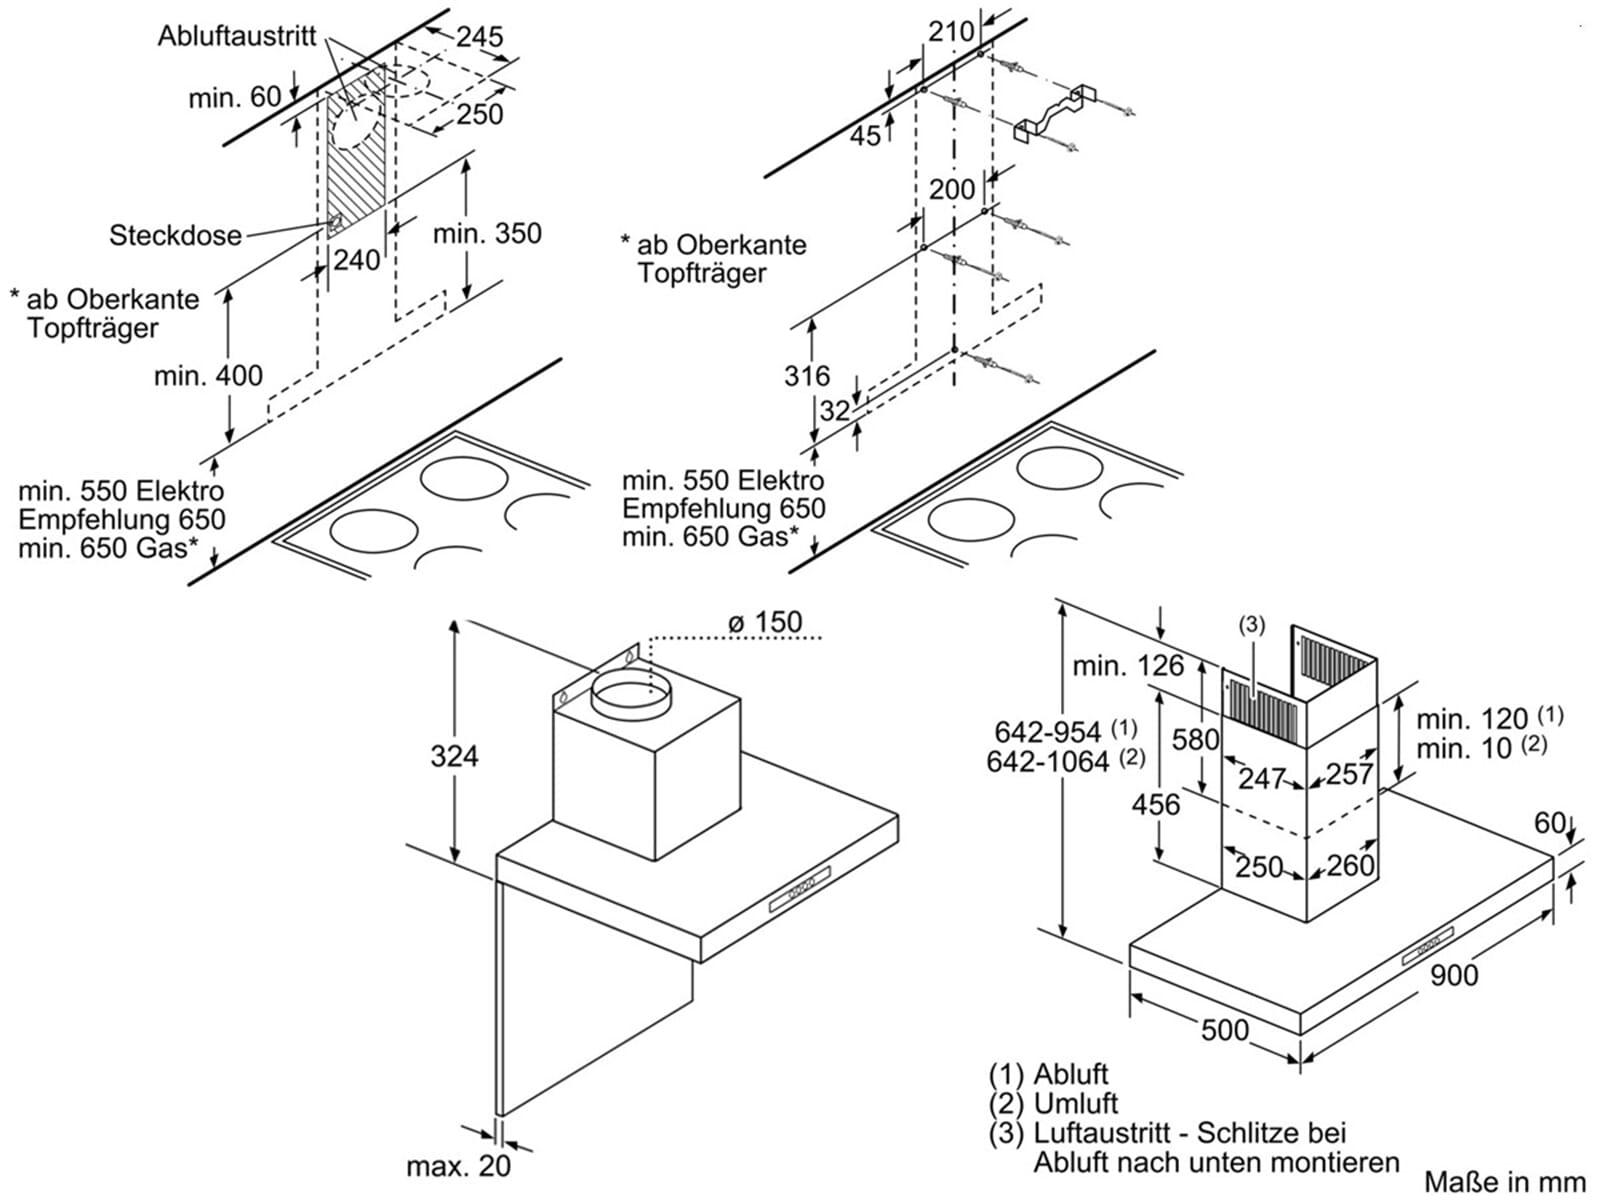 bosch dwb09w452 wand dunstabzugshaube edelstahl abzug metallfettfilter 90 breit ebay. Black Bedroom Furniture Sets. Home Design Ideas